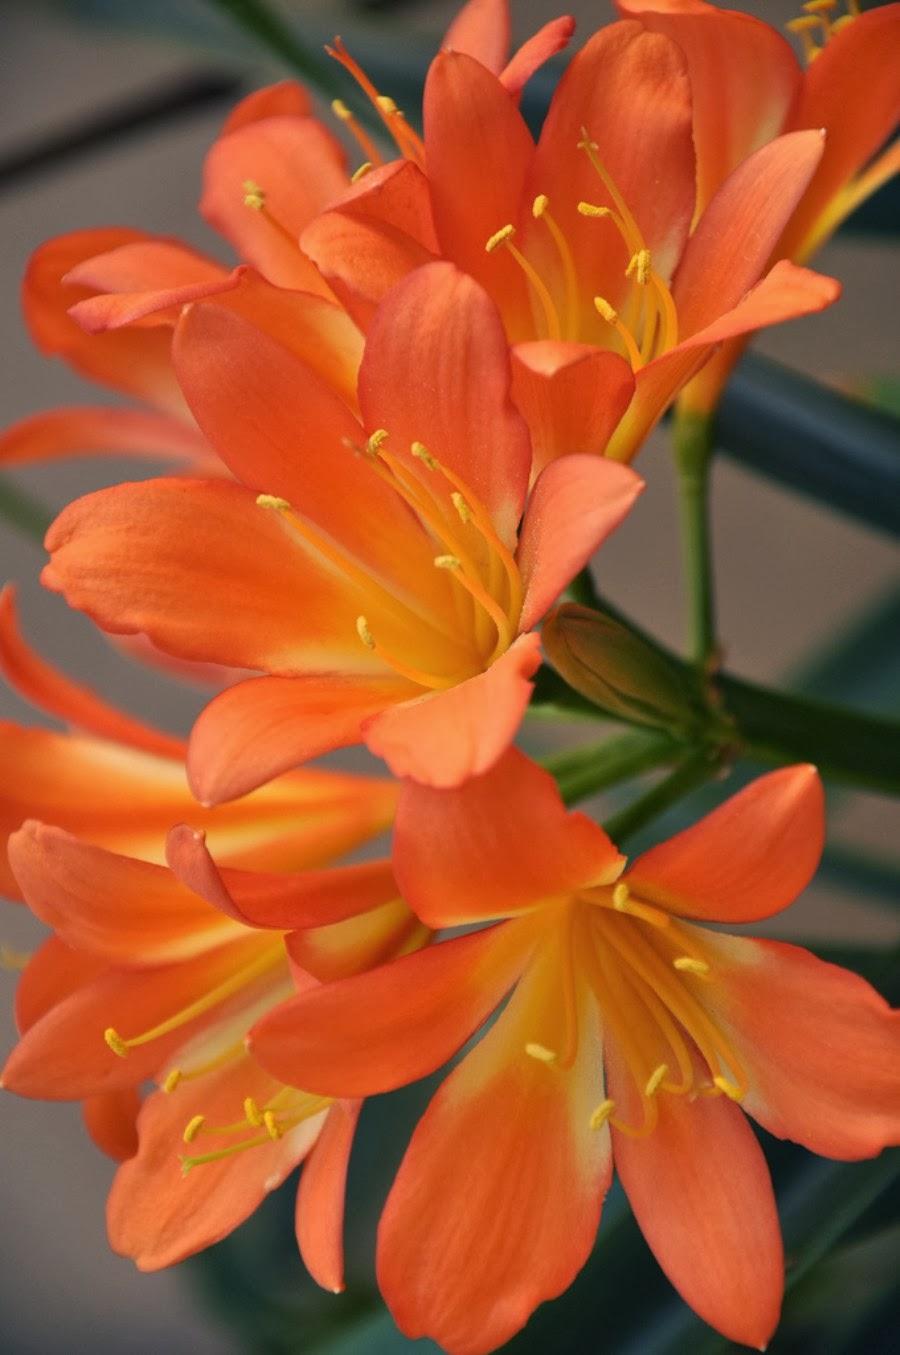 World Most Beautiful Flowers Wallpapers Hd Wallpapers Most Beautiful Flowers Wallpapers Hd 900x1355 Wallpaper Teahub Io